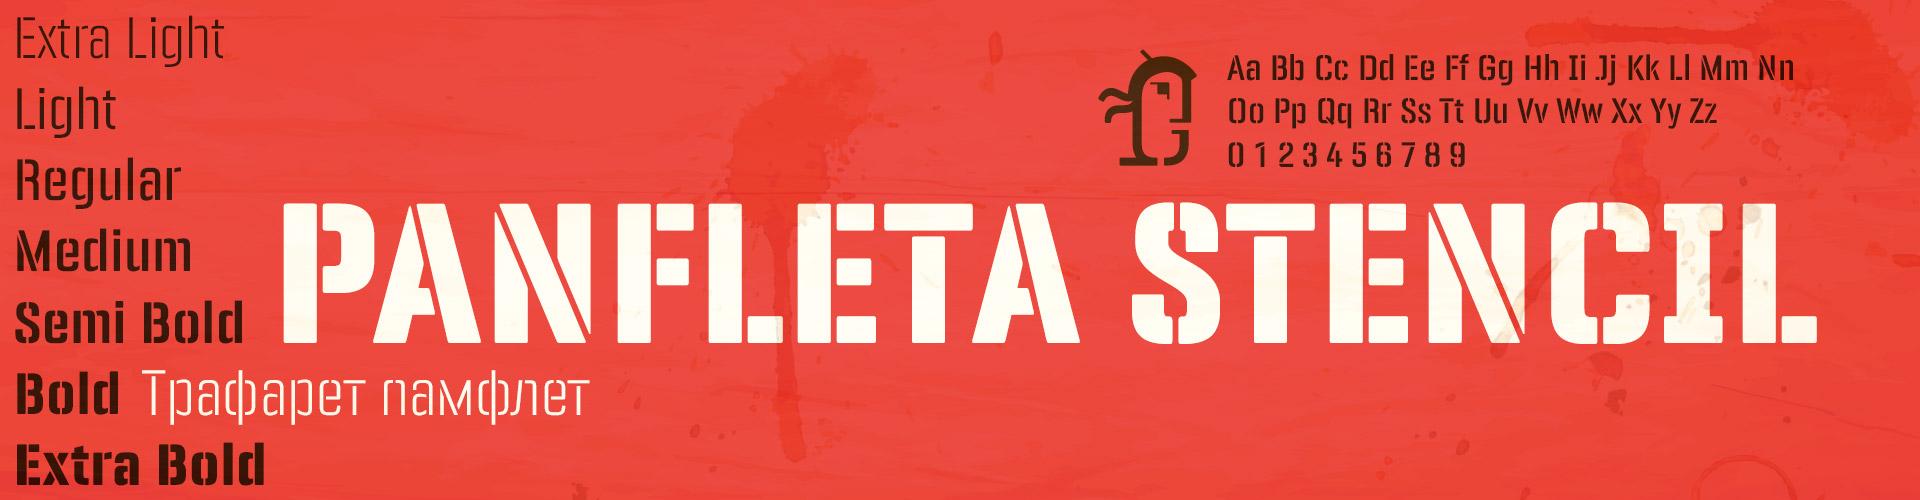 Panfleta Stencil Fonts Latin Extended-A & Cyrillic